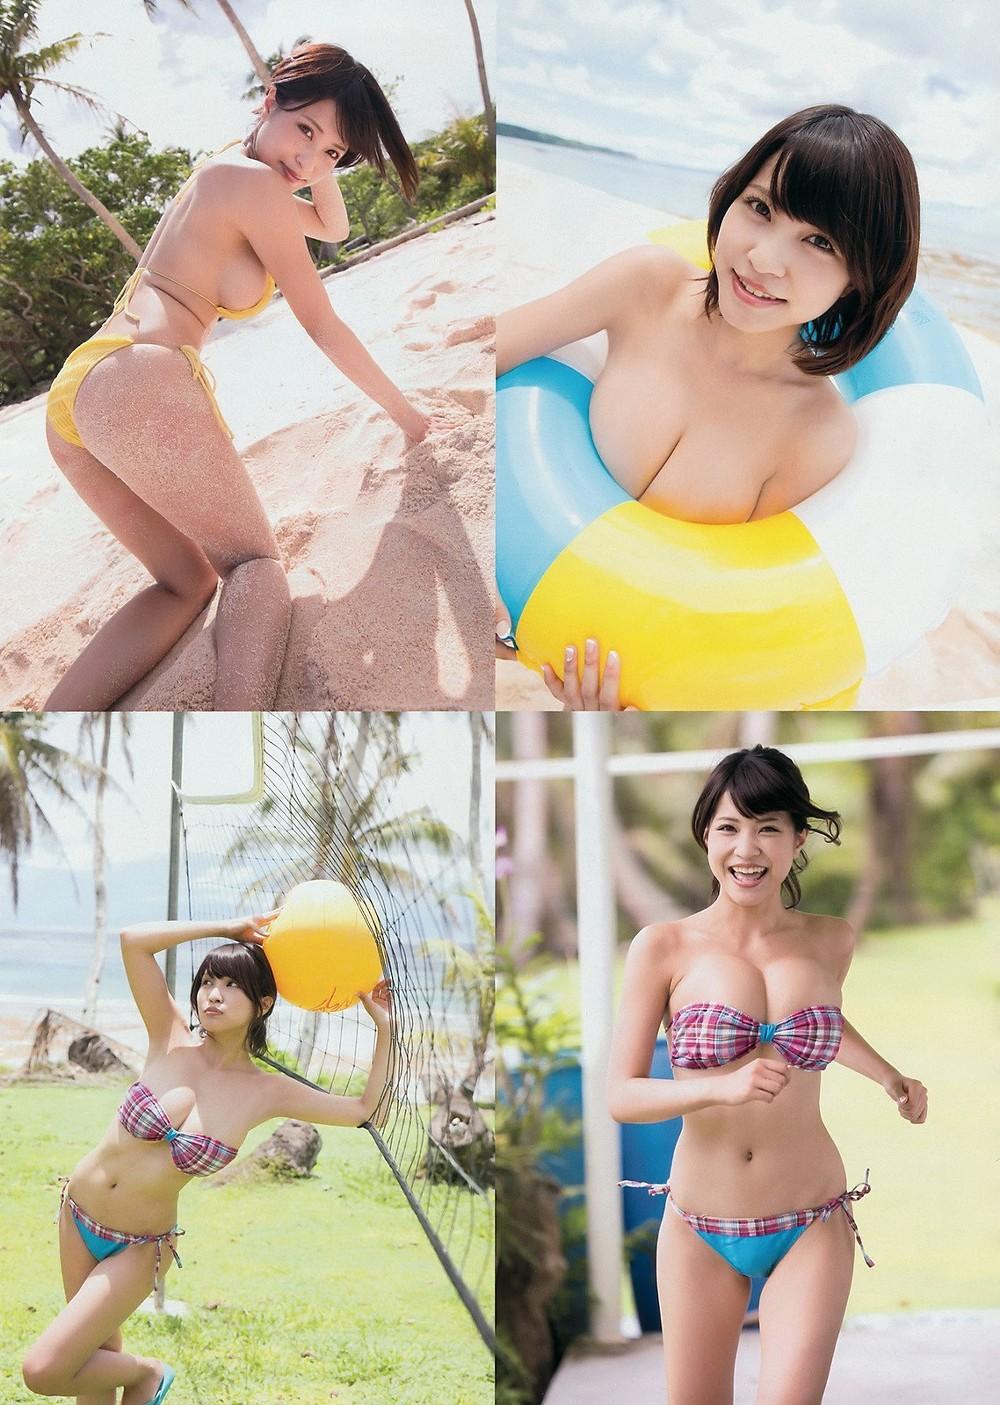 Asuka Kishi Porn asuka kishi porn pic - eporner